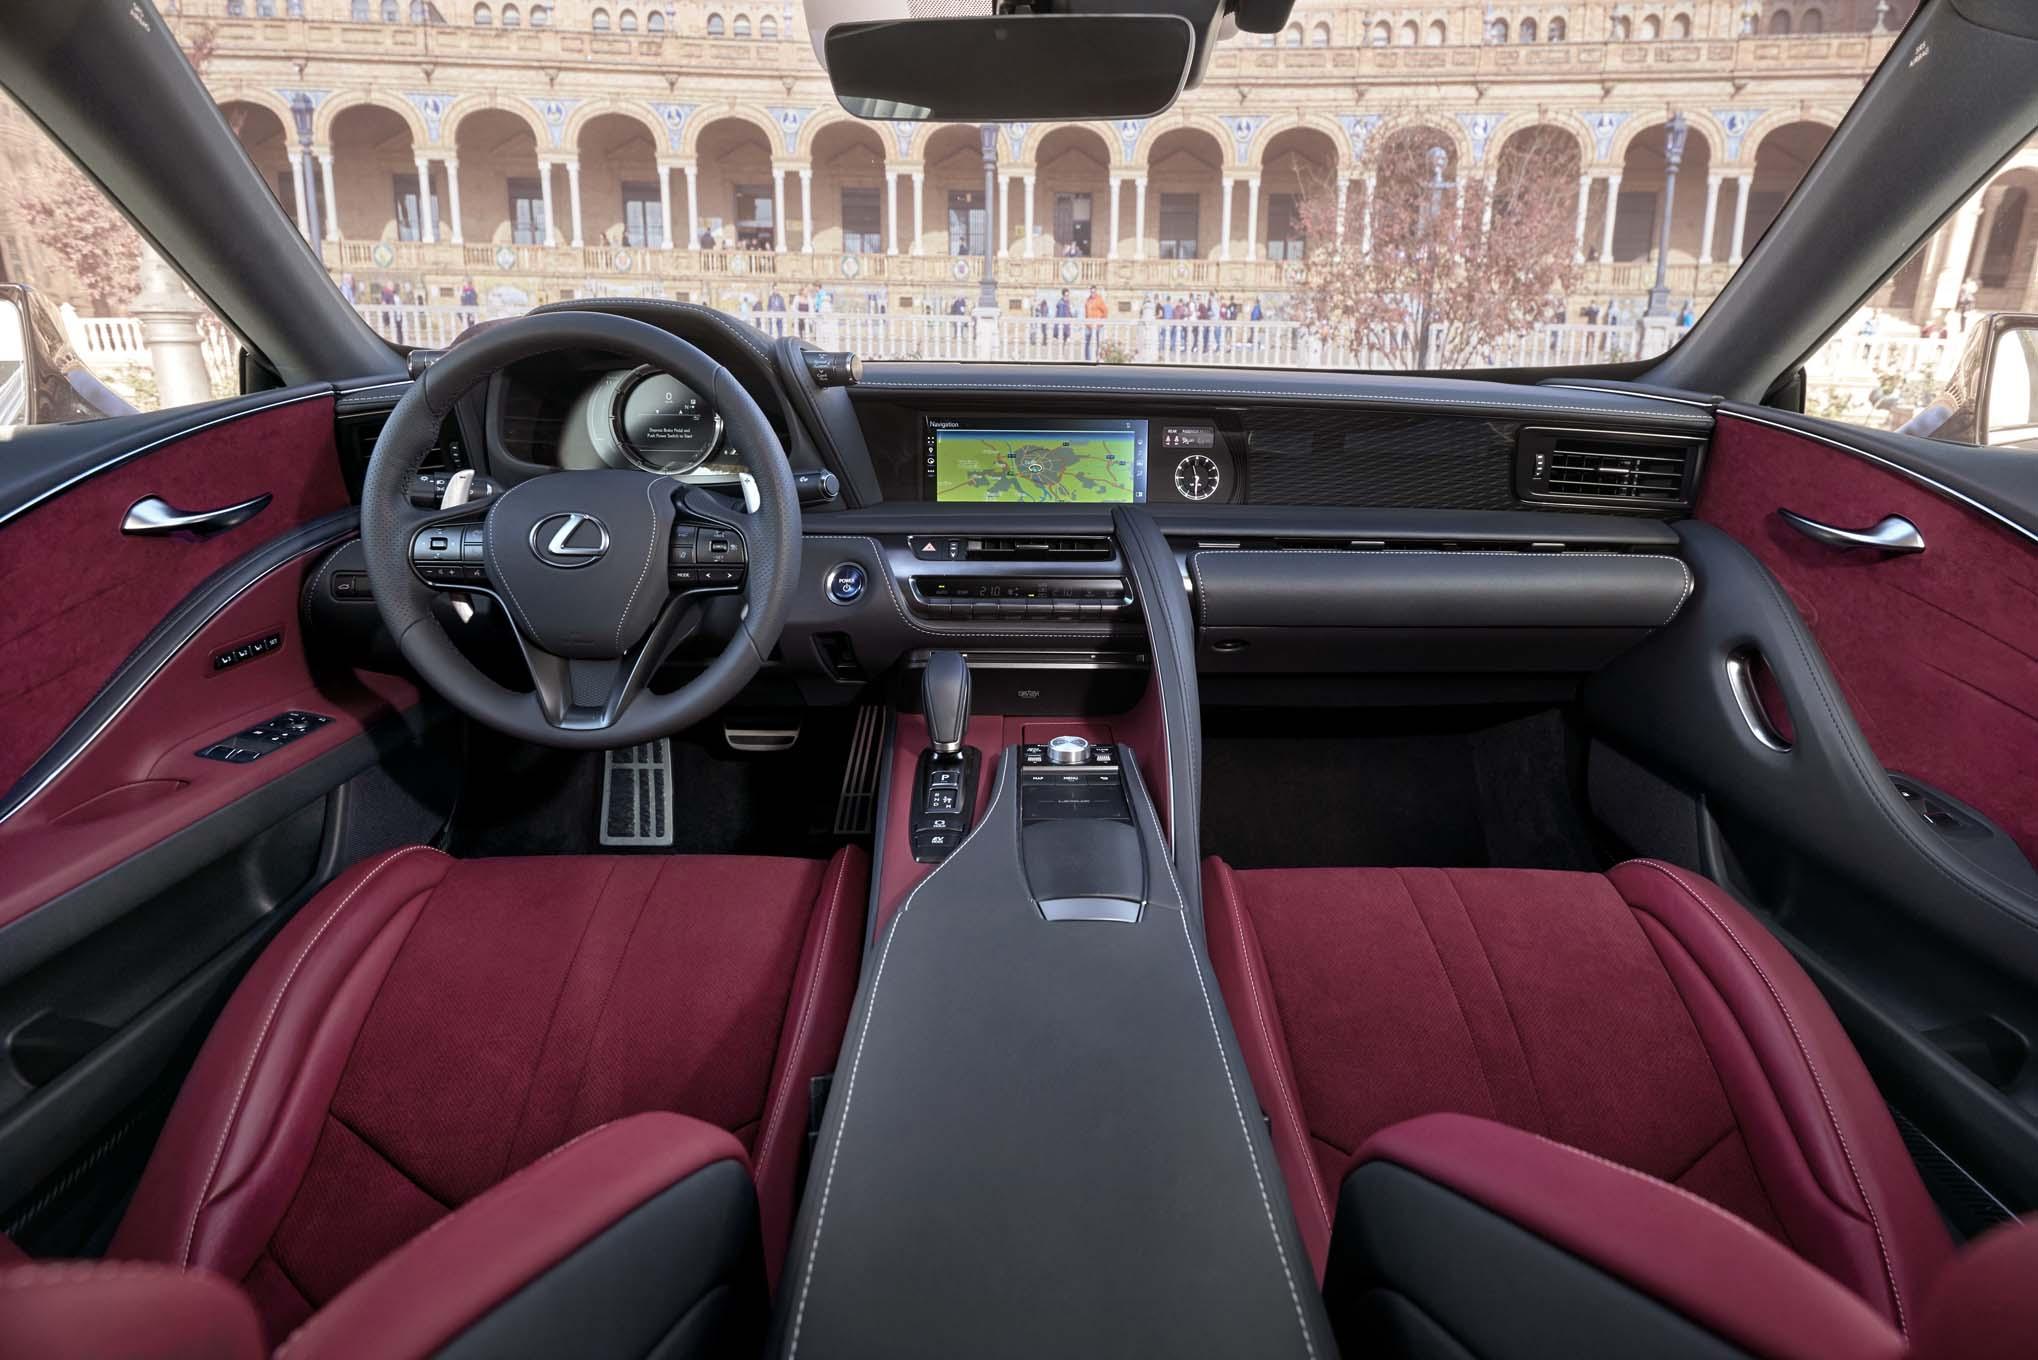 http://st.automobilemag.com/uploads/sites/11/2016/12/2018-Lexus-LC-500h-interior.jpg